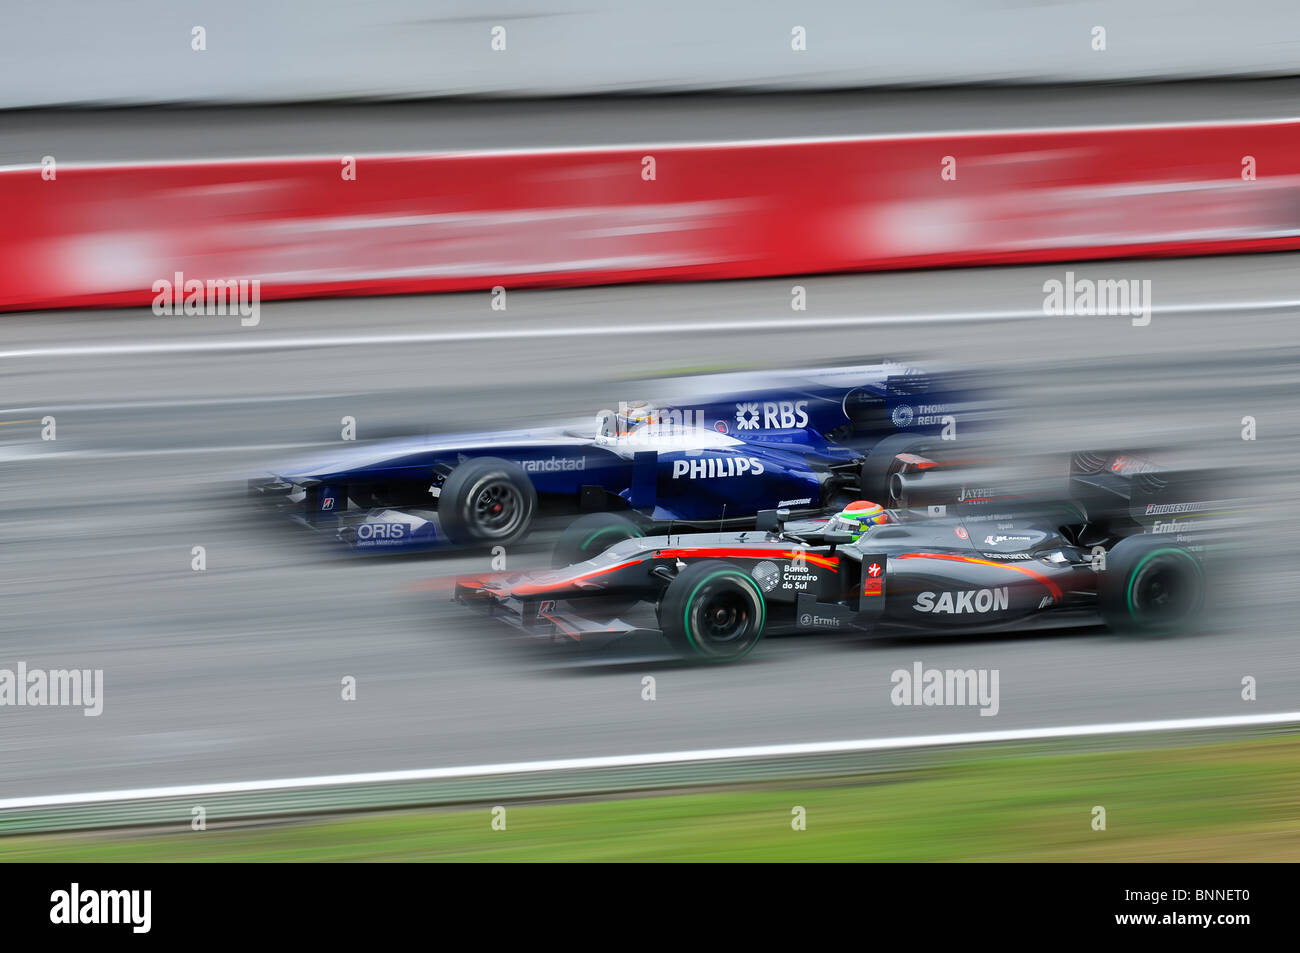 Formula 1 Hockenheimring Hockenheim Germany Europe one formula racing motor sport cars driving fast 1 - Stock Image